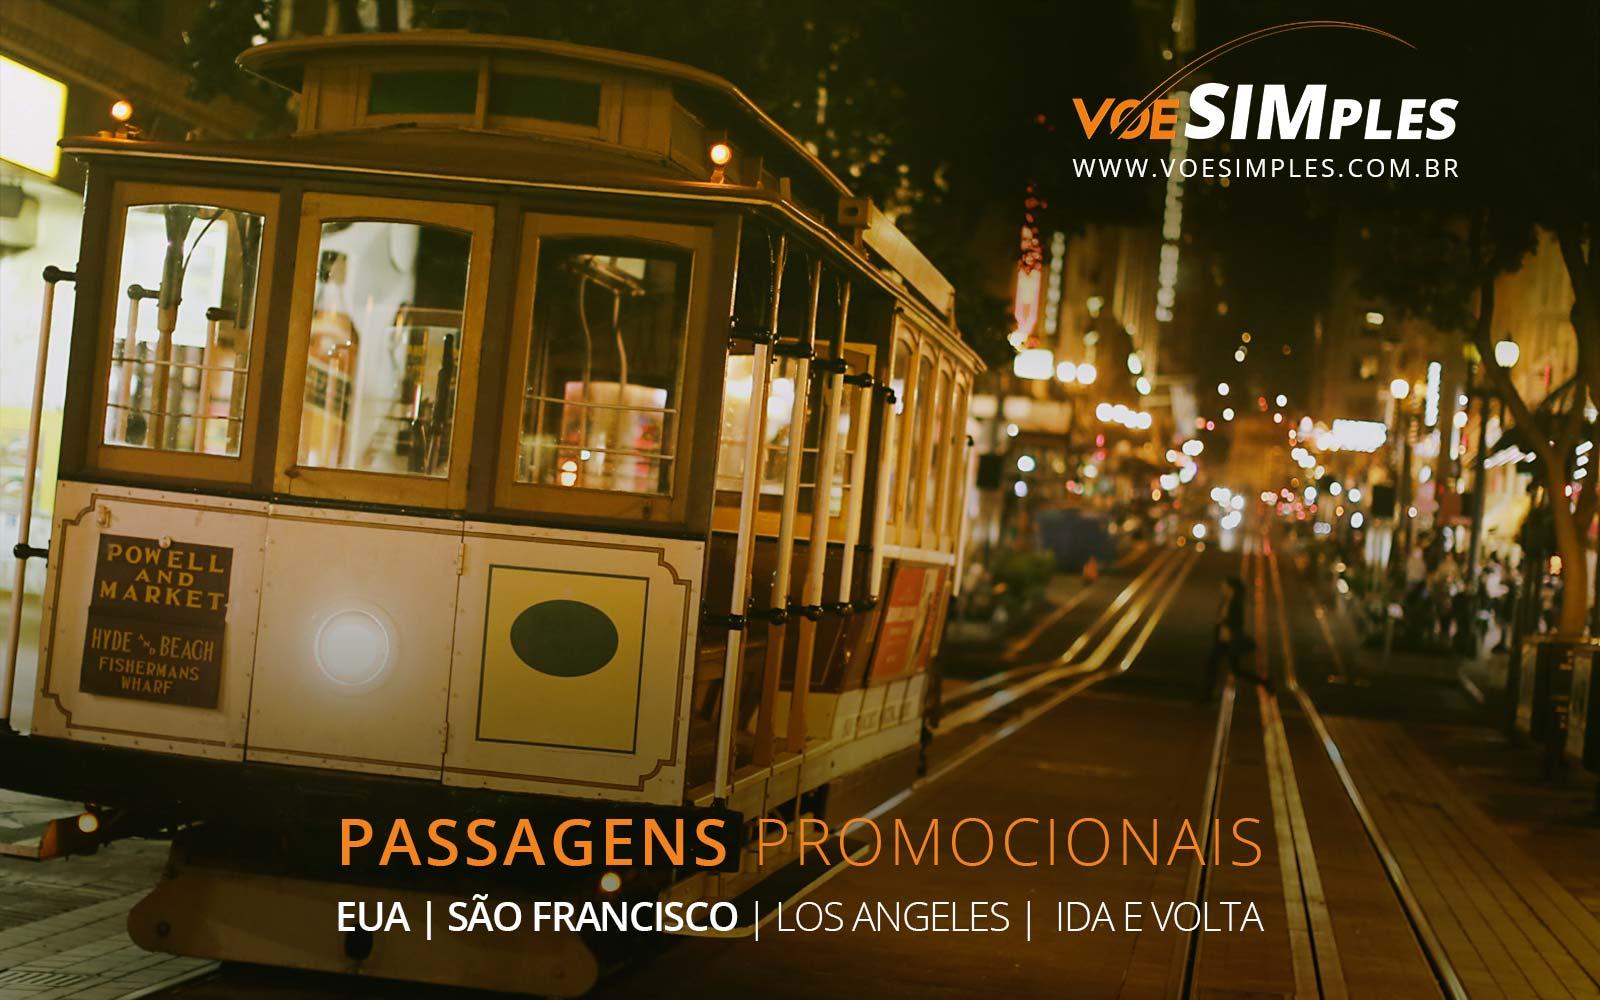 Passagens aéreas baratas para Los Angeles e San Francisco nos Estados Unidos.